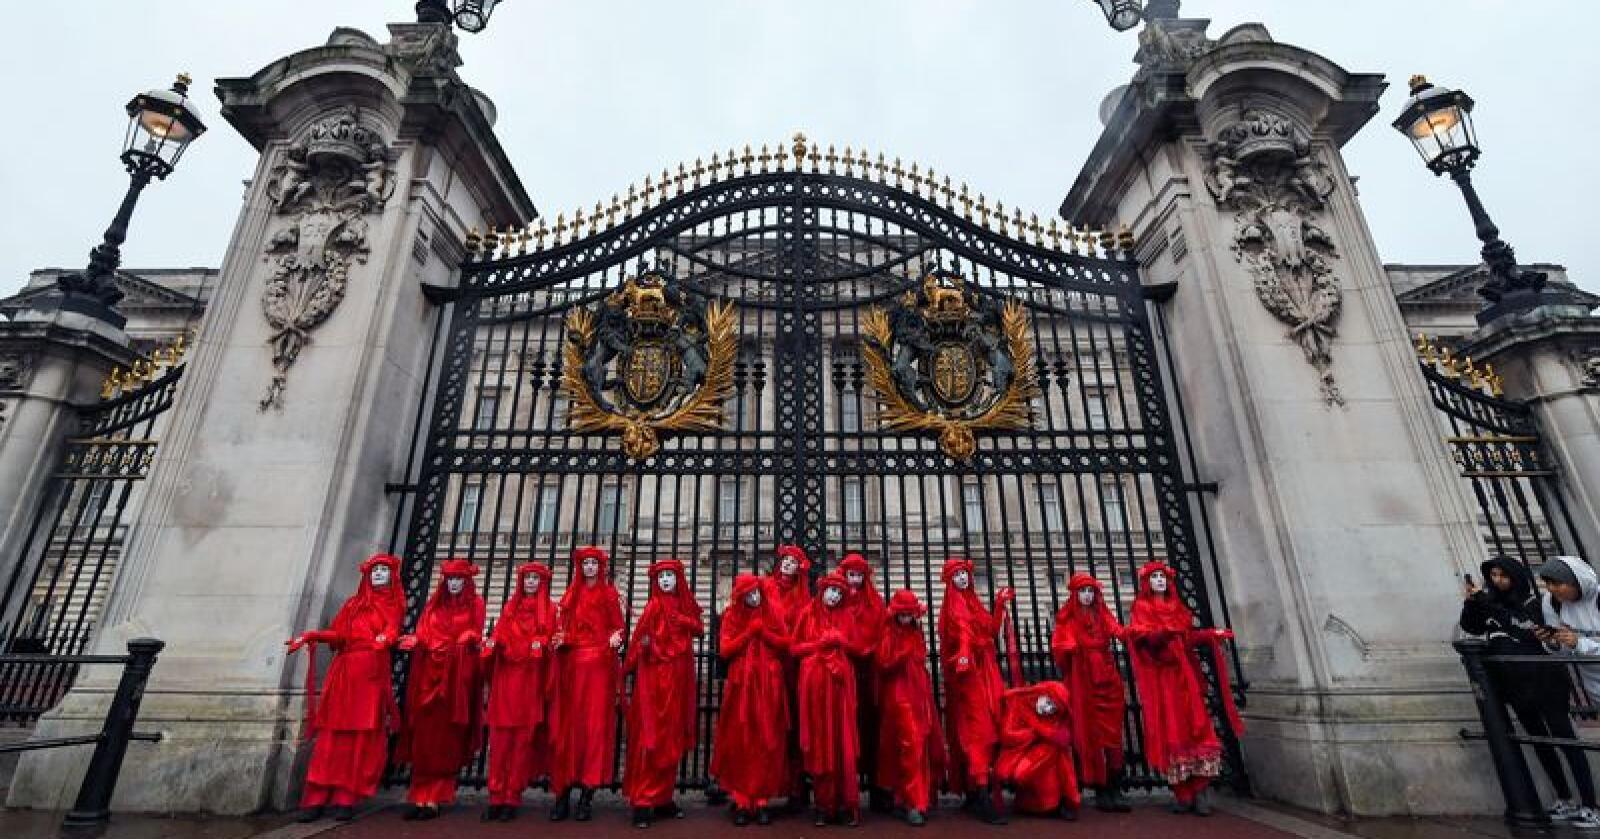 Extinction Rebellion-aktivister poserer for fotografene utenfor Buckingham Palace i London mandag. Foto: Alberto Pezzali / AP / NTB scanpix